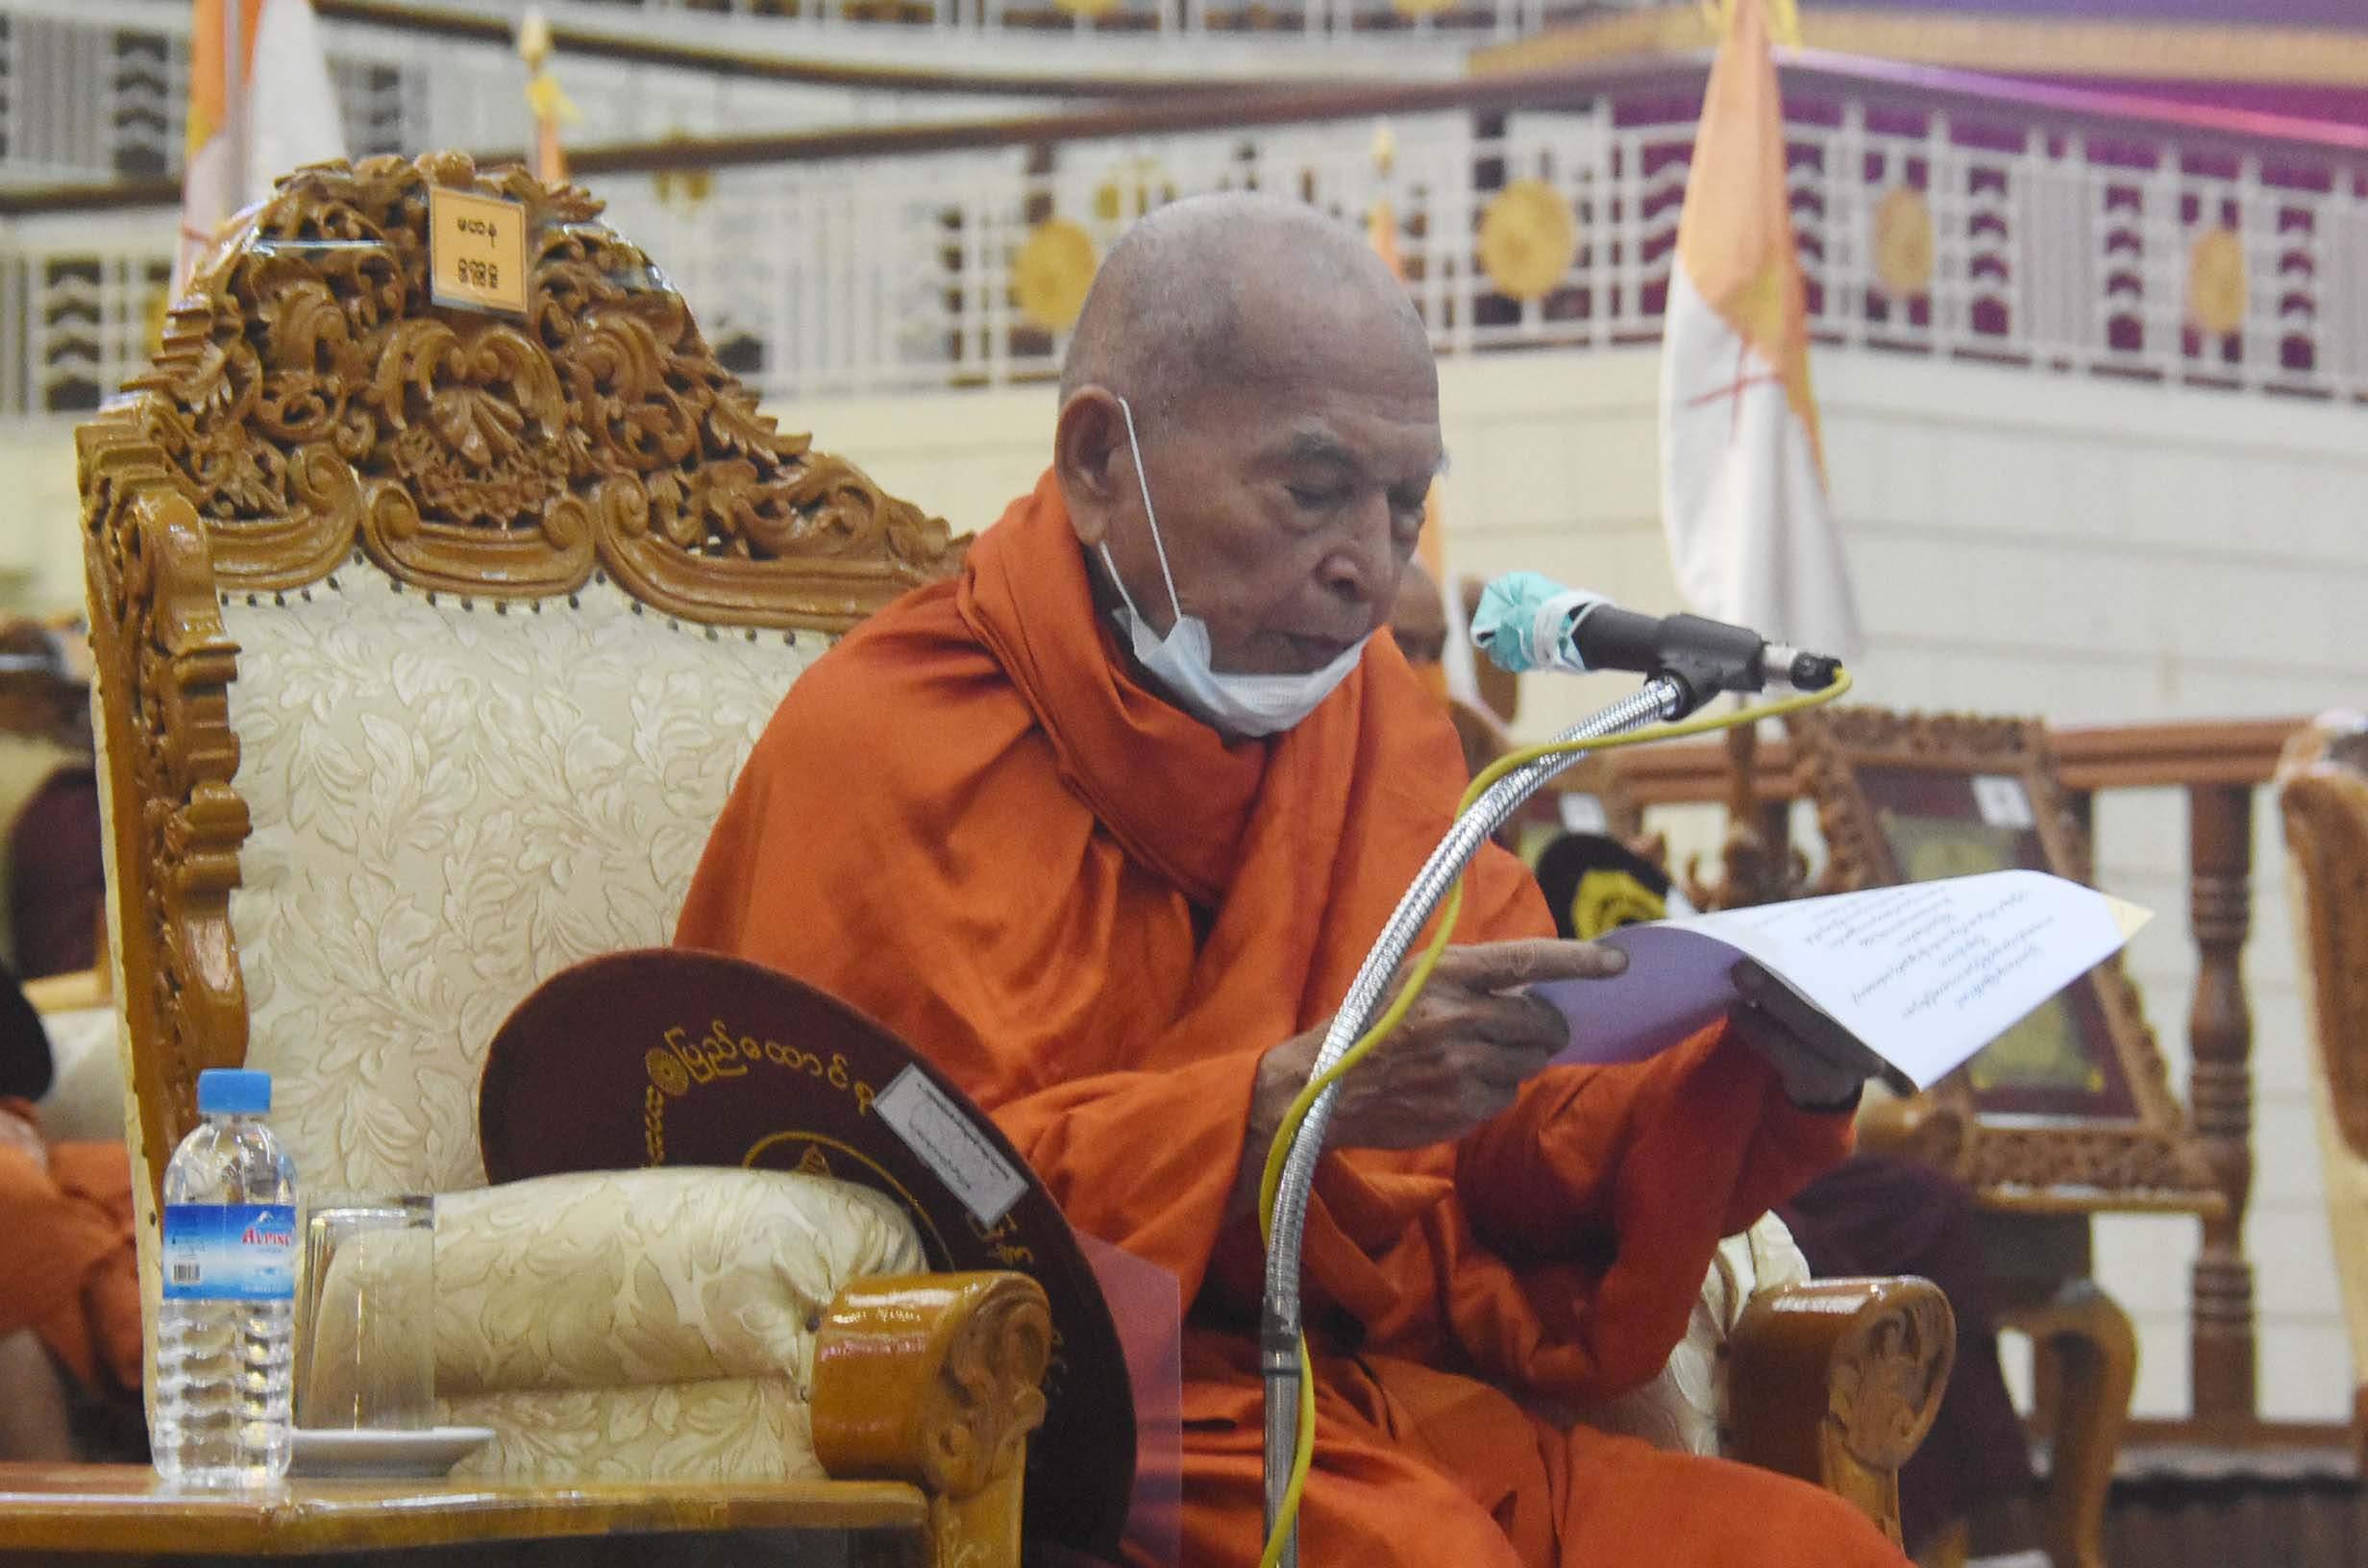 Abhidhaja Maharatthaguru Abhidhaja Aggamaha Saddhammajotika Bhamo Sayadaw Bhaddanta Kumara  delivers Ovadakahta(words of advice).Photo: MNA